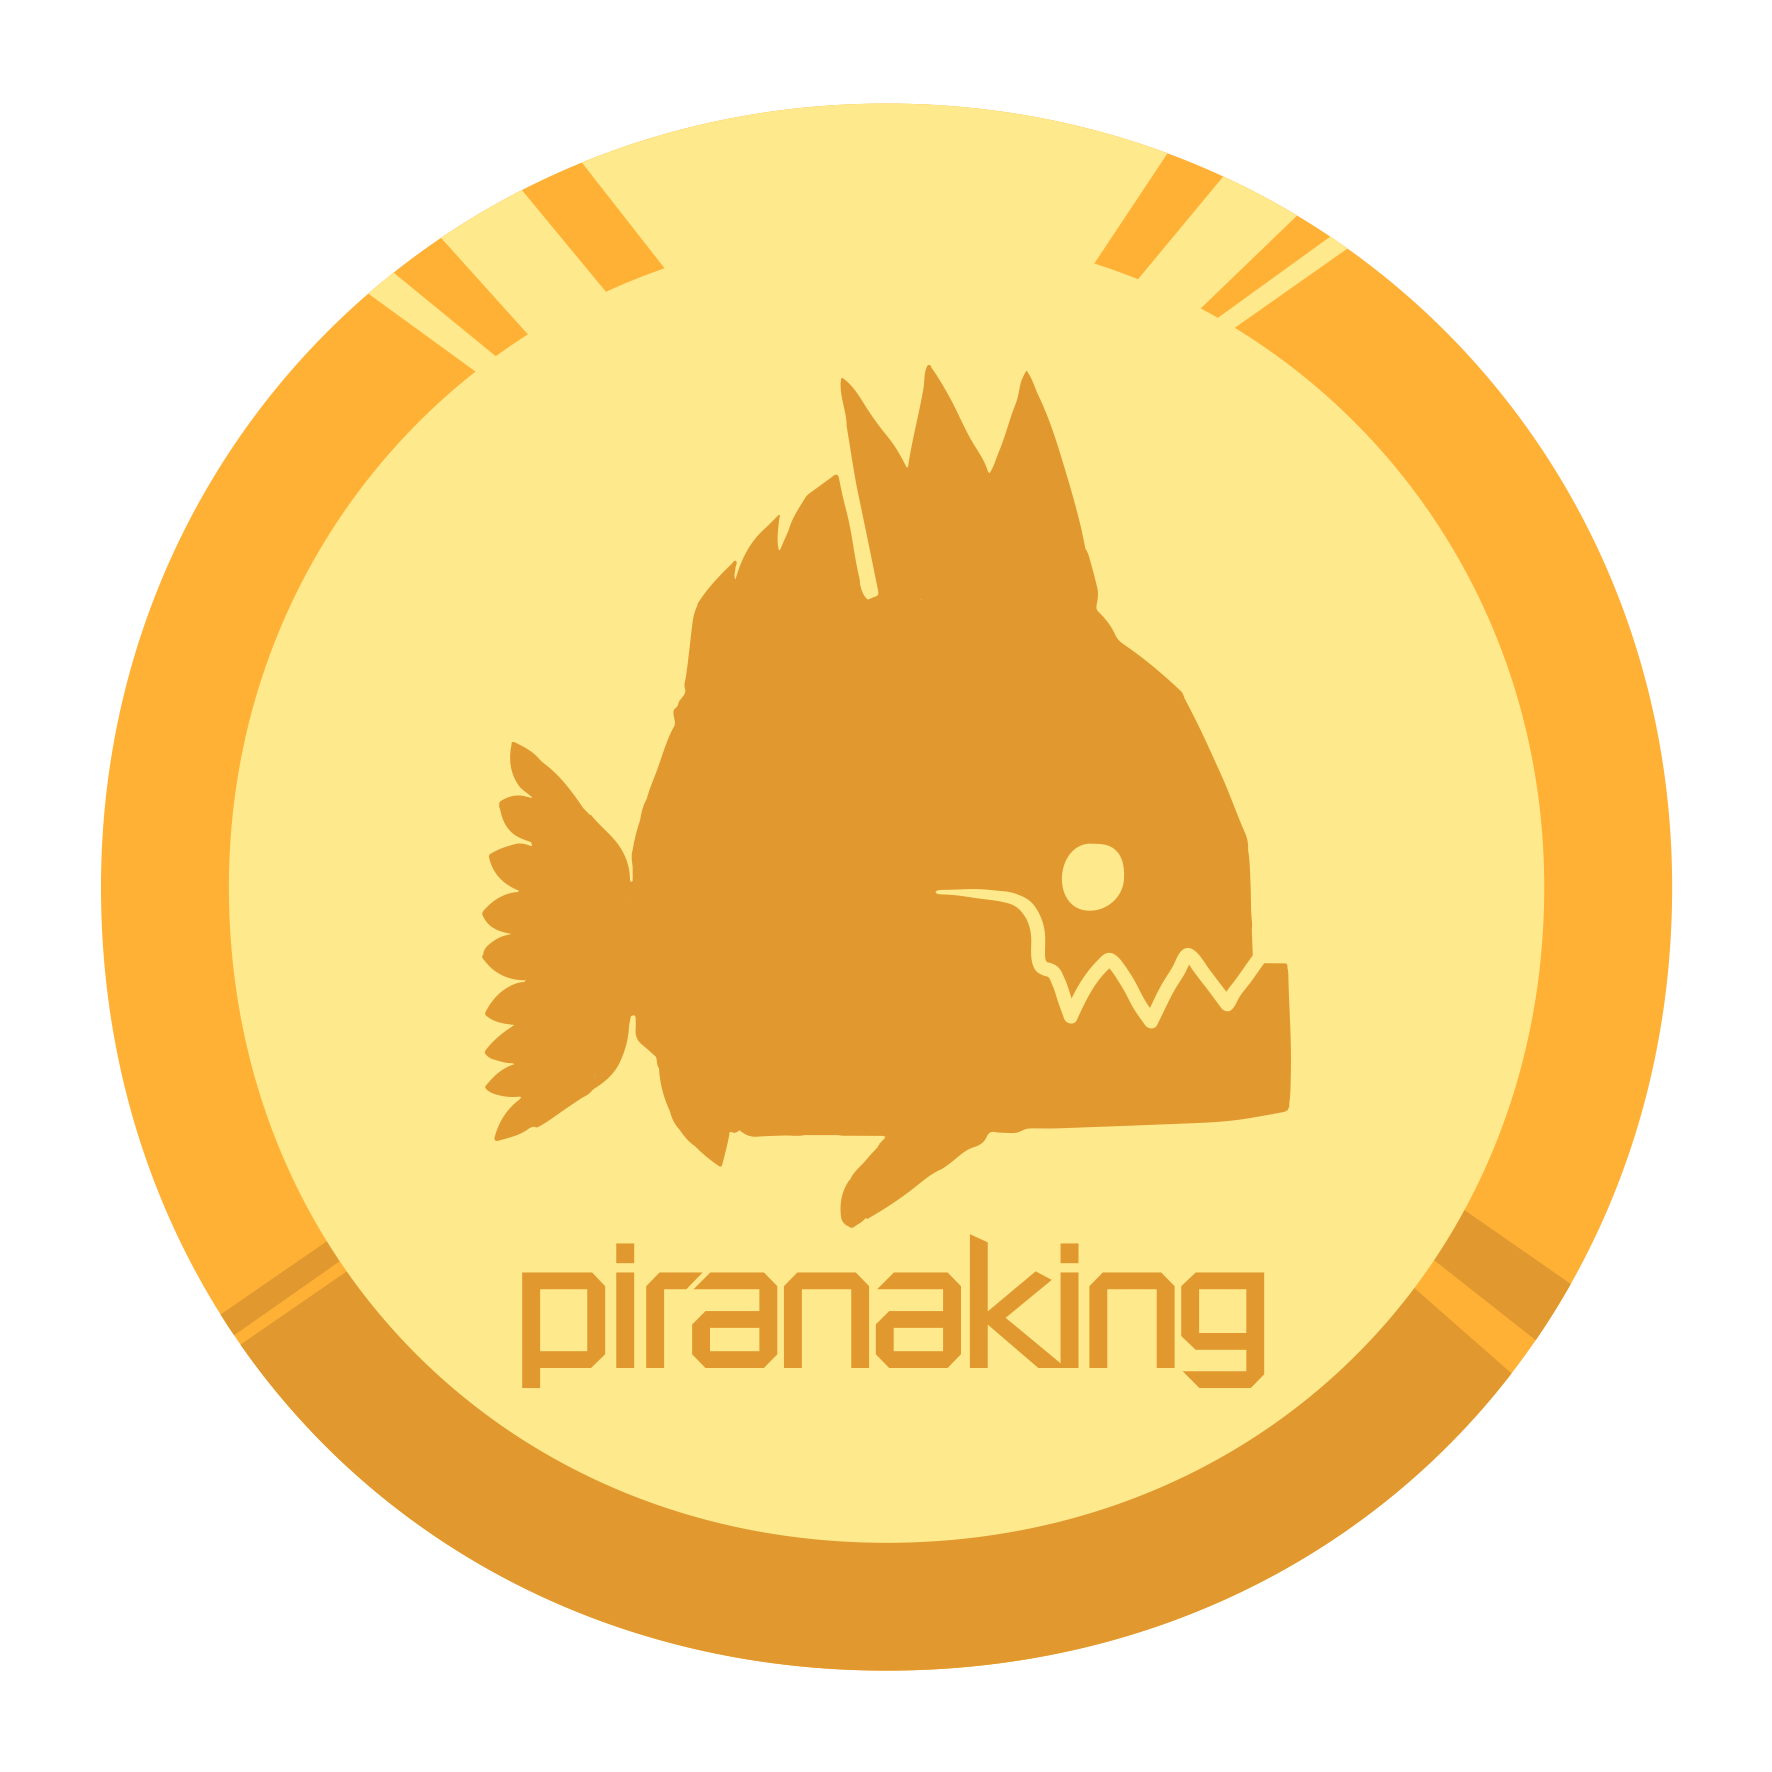 Piranaking